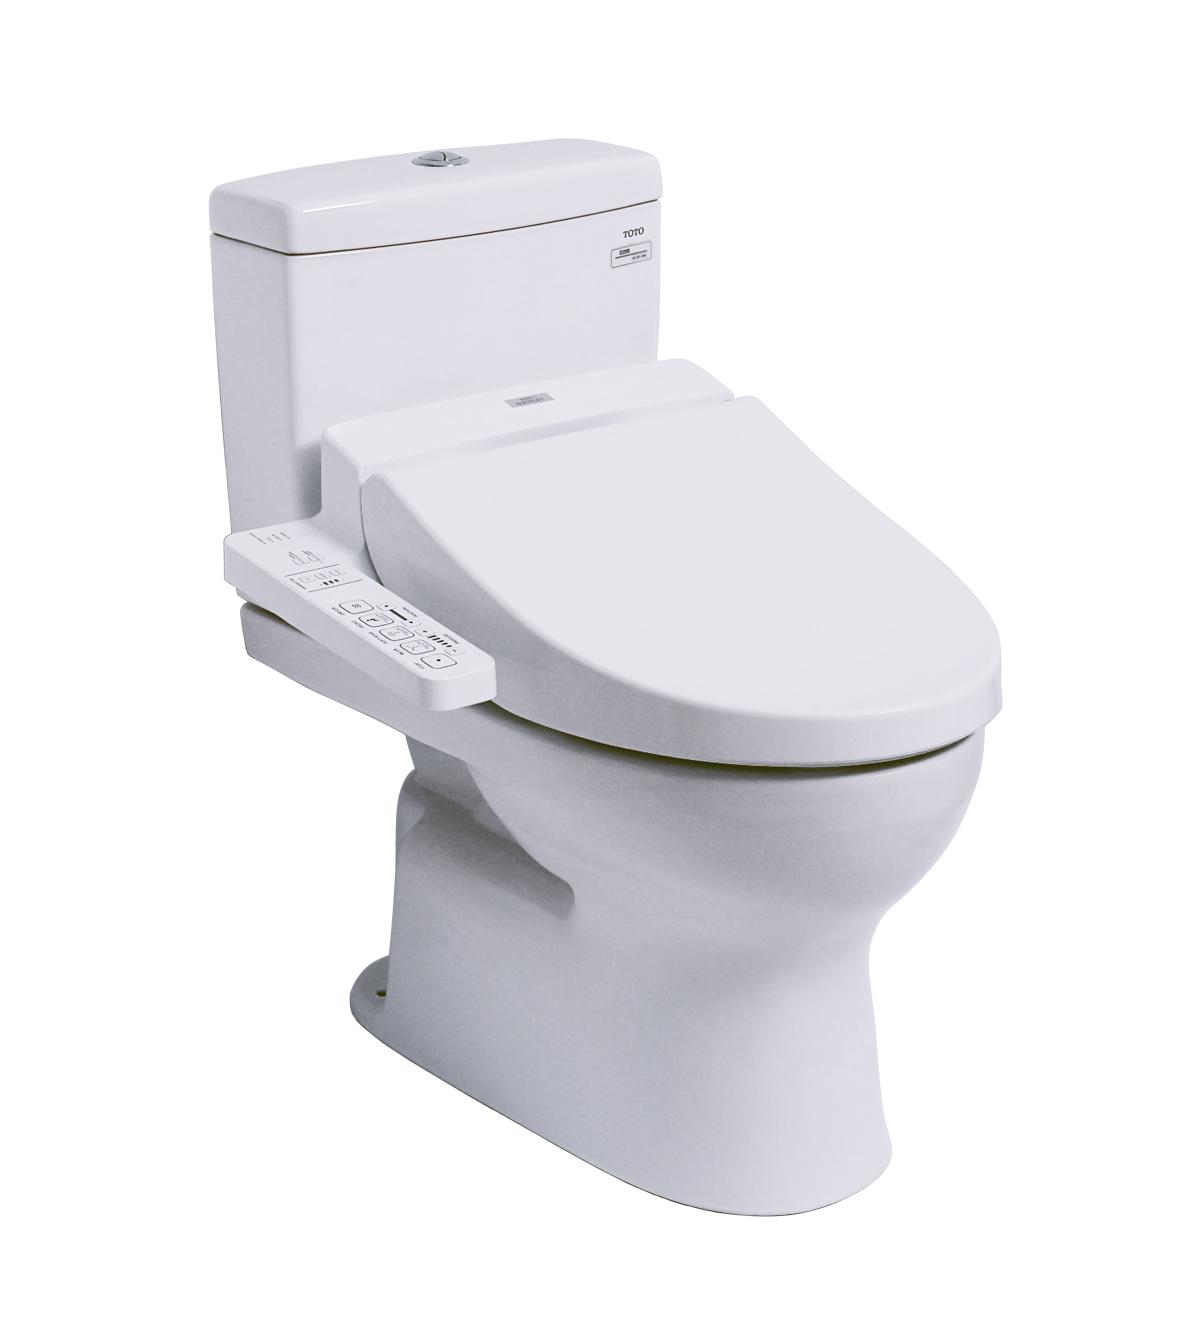 Bồn cầu toto Washlet CST300DSW3